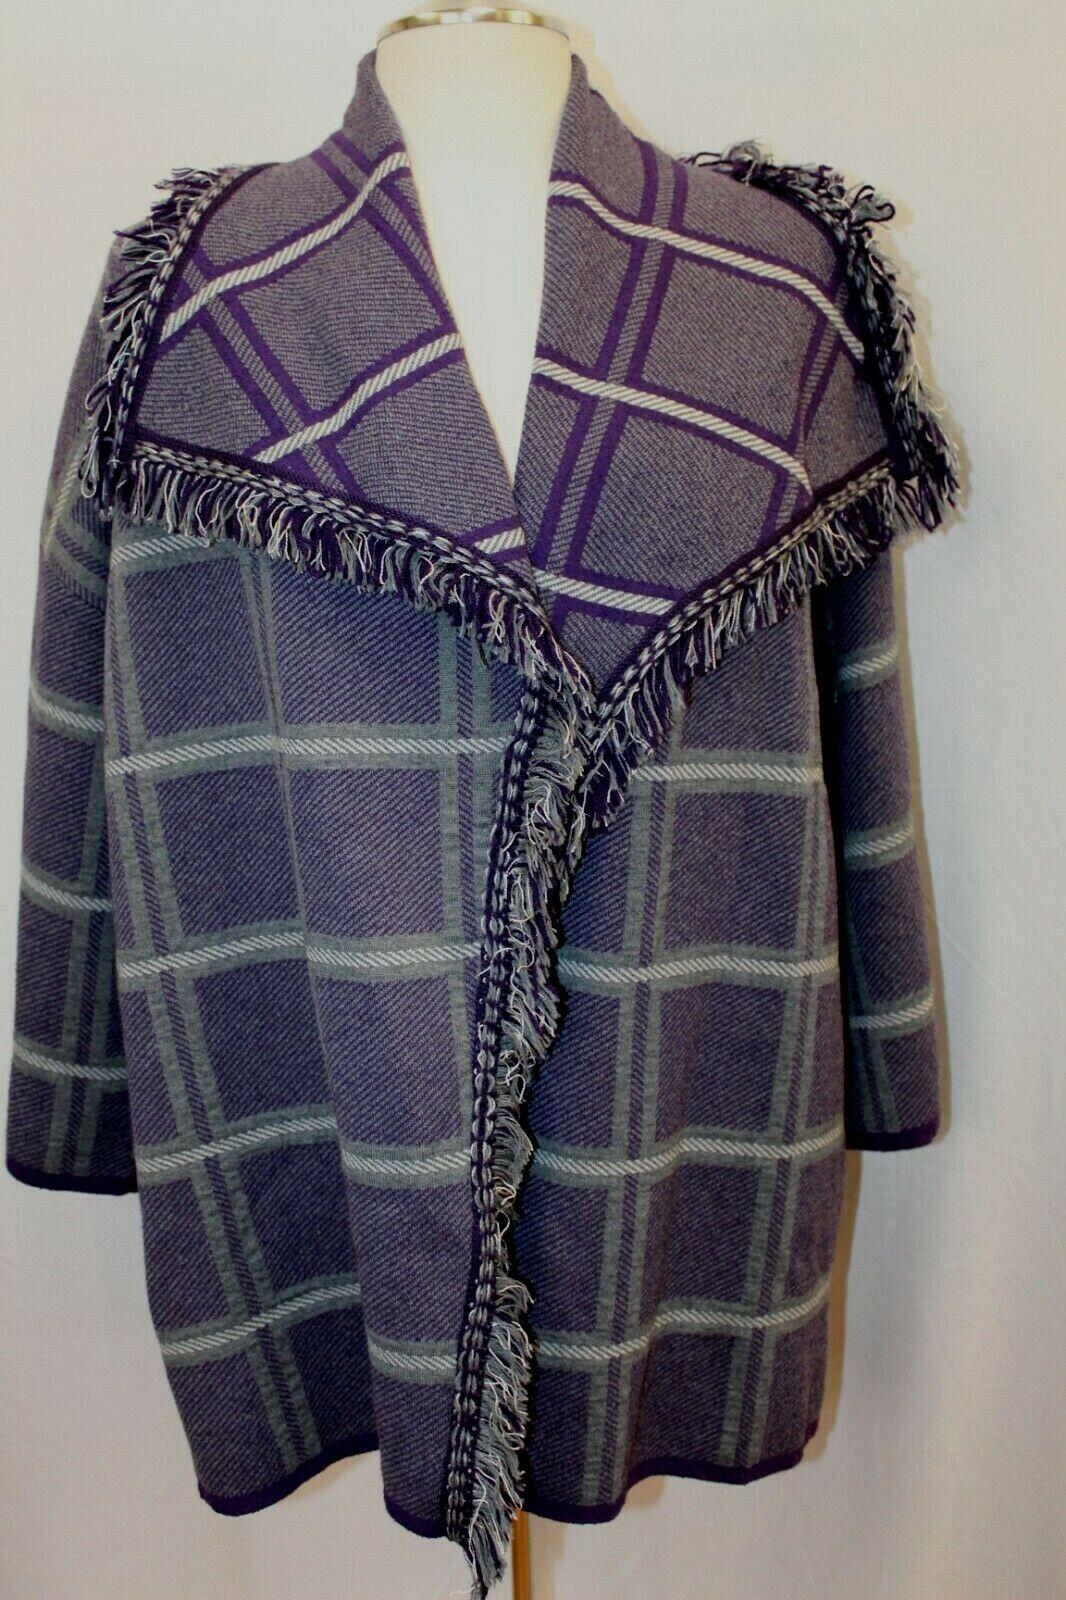 Nuevo St. John Royal Amatista  Suéter Chaqueta De Punto Chaqueta Sweater L Grande  895  Esperando por ti